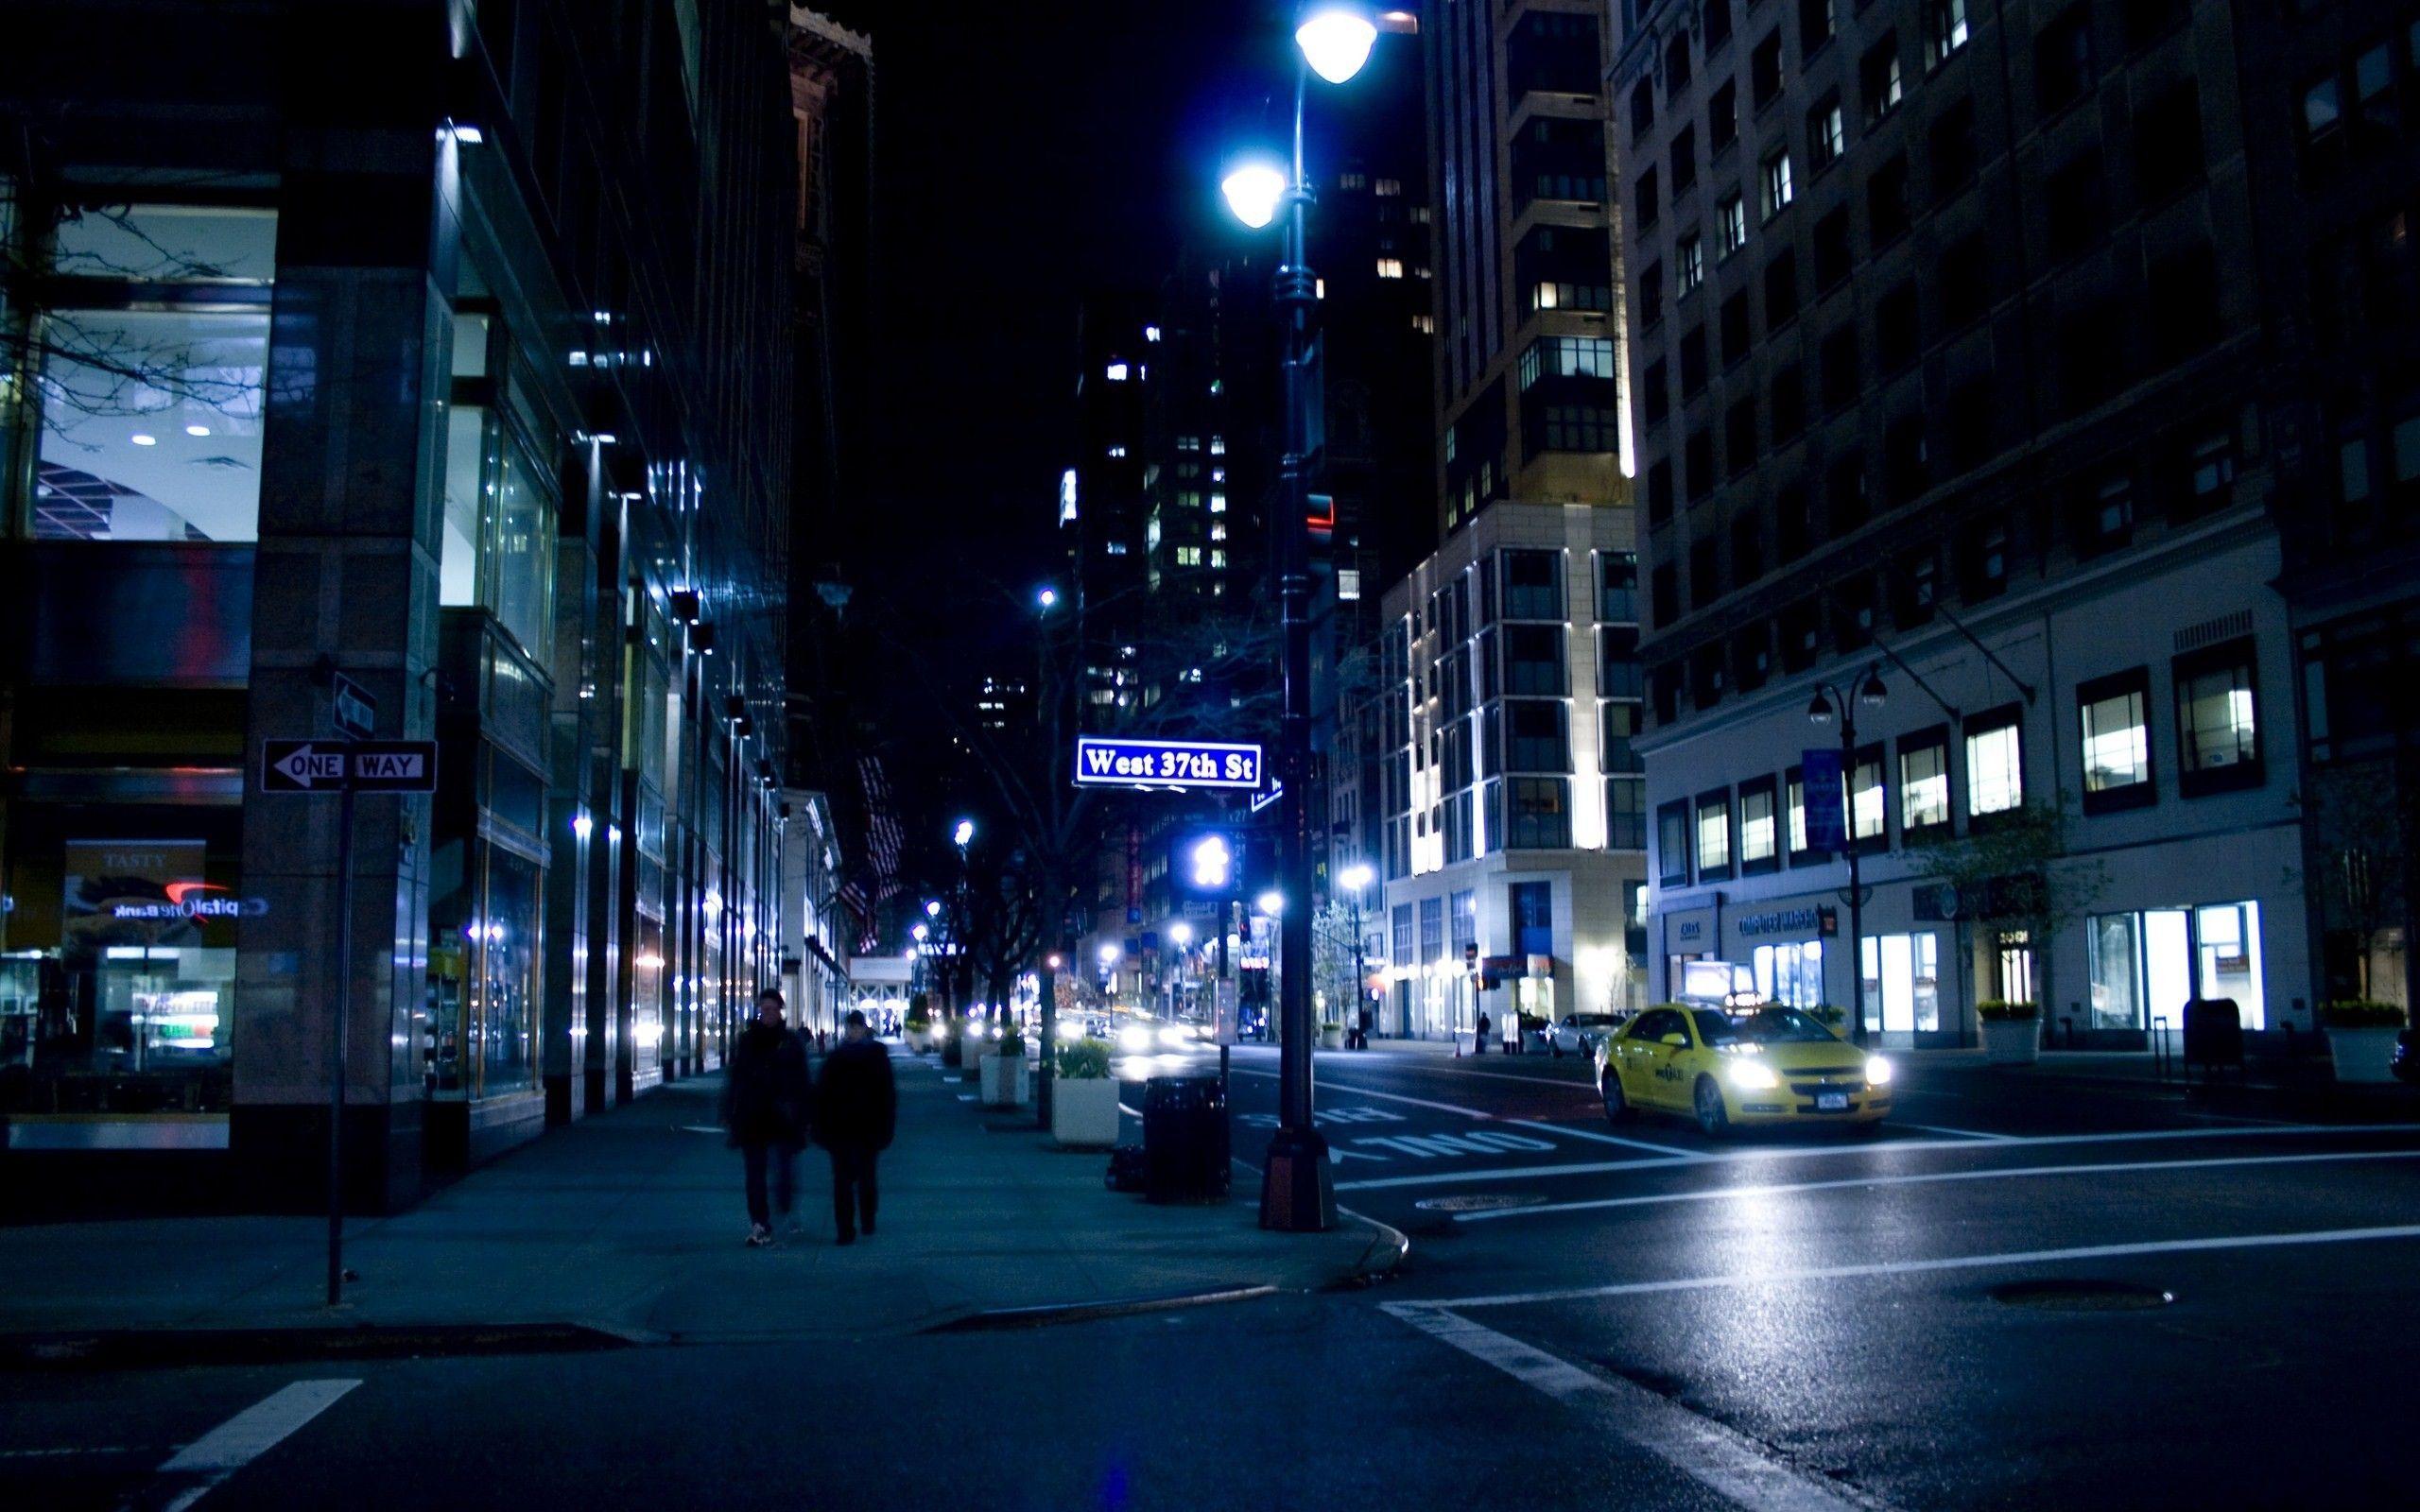 pin city nightlife wallpaper - photo #41